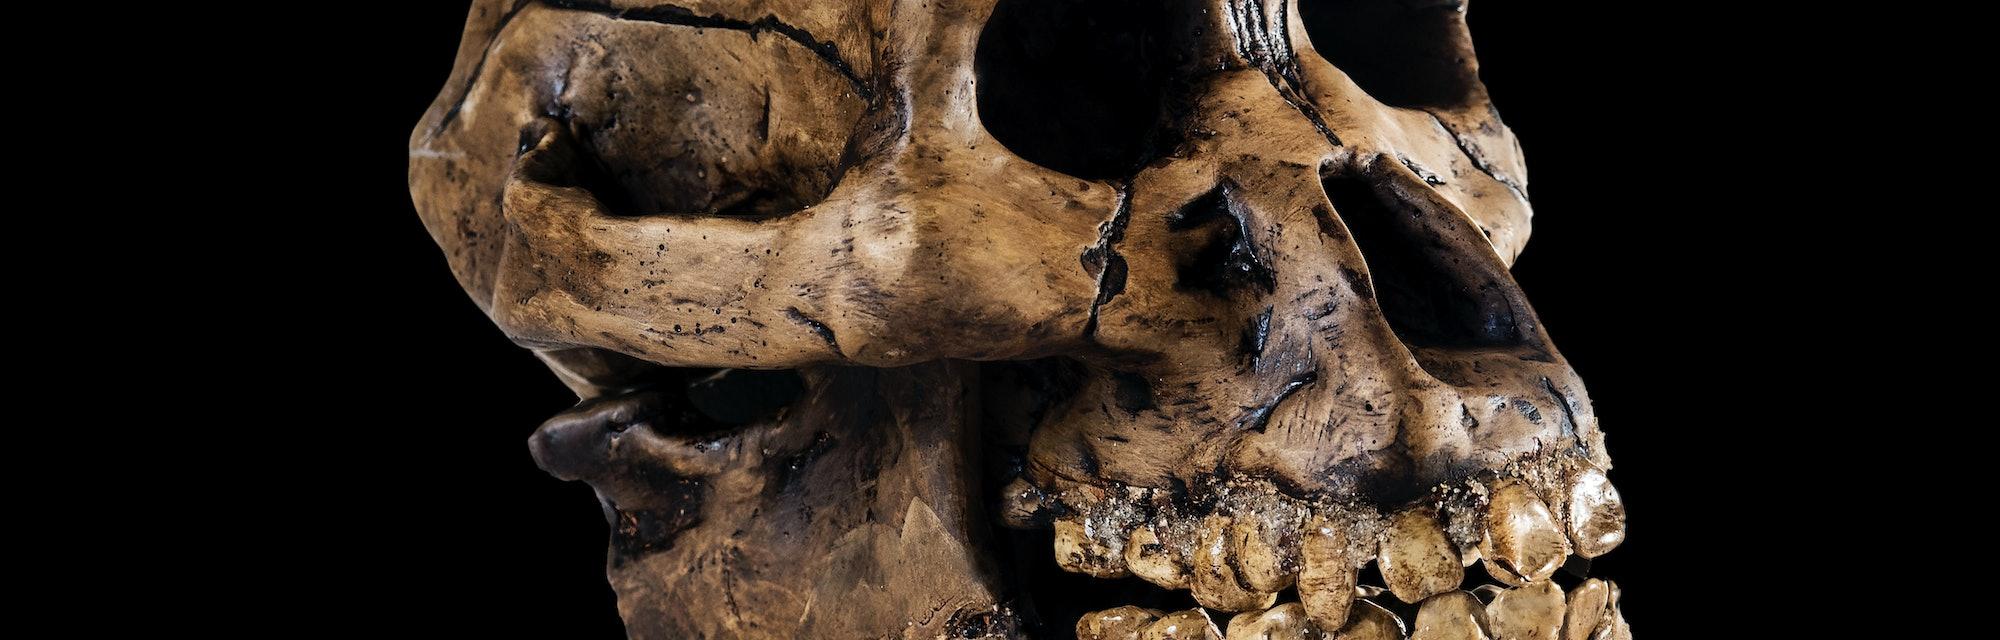 ancient human skull